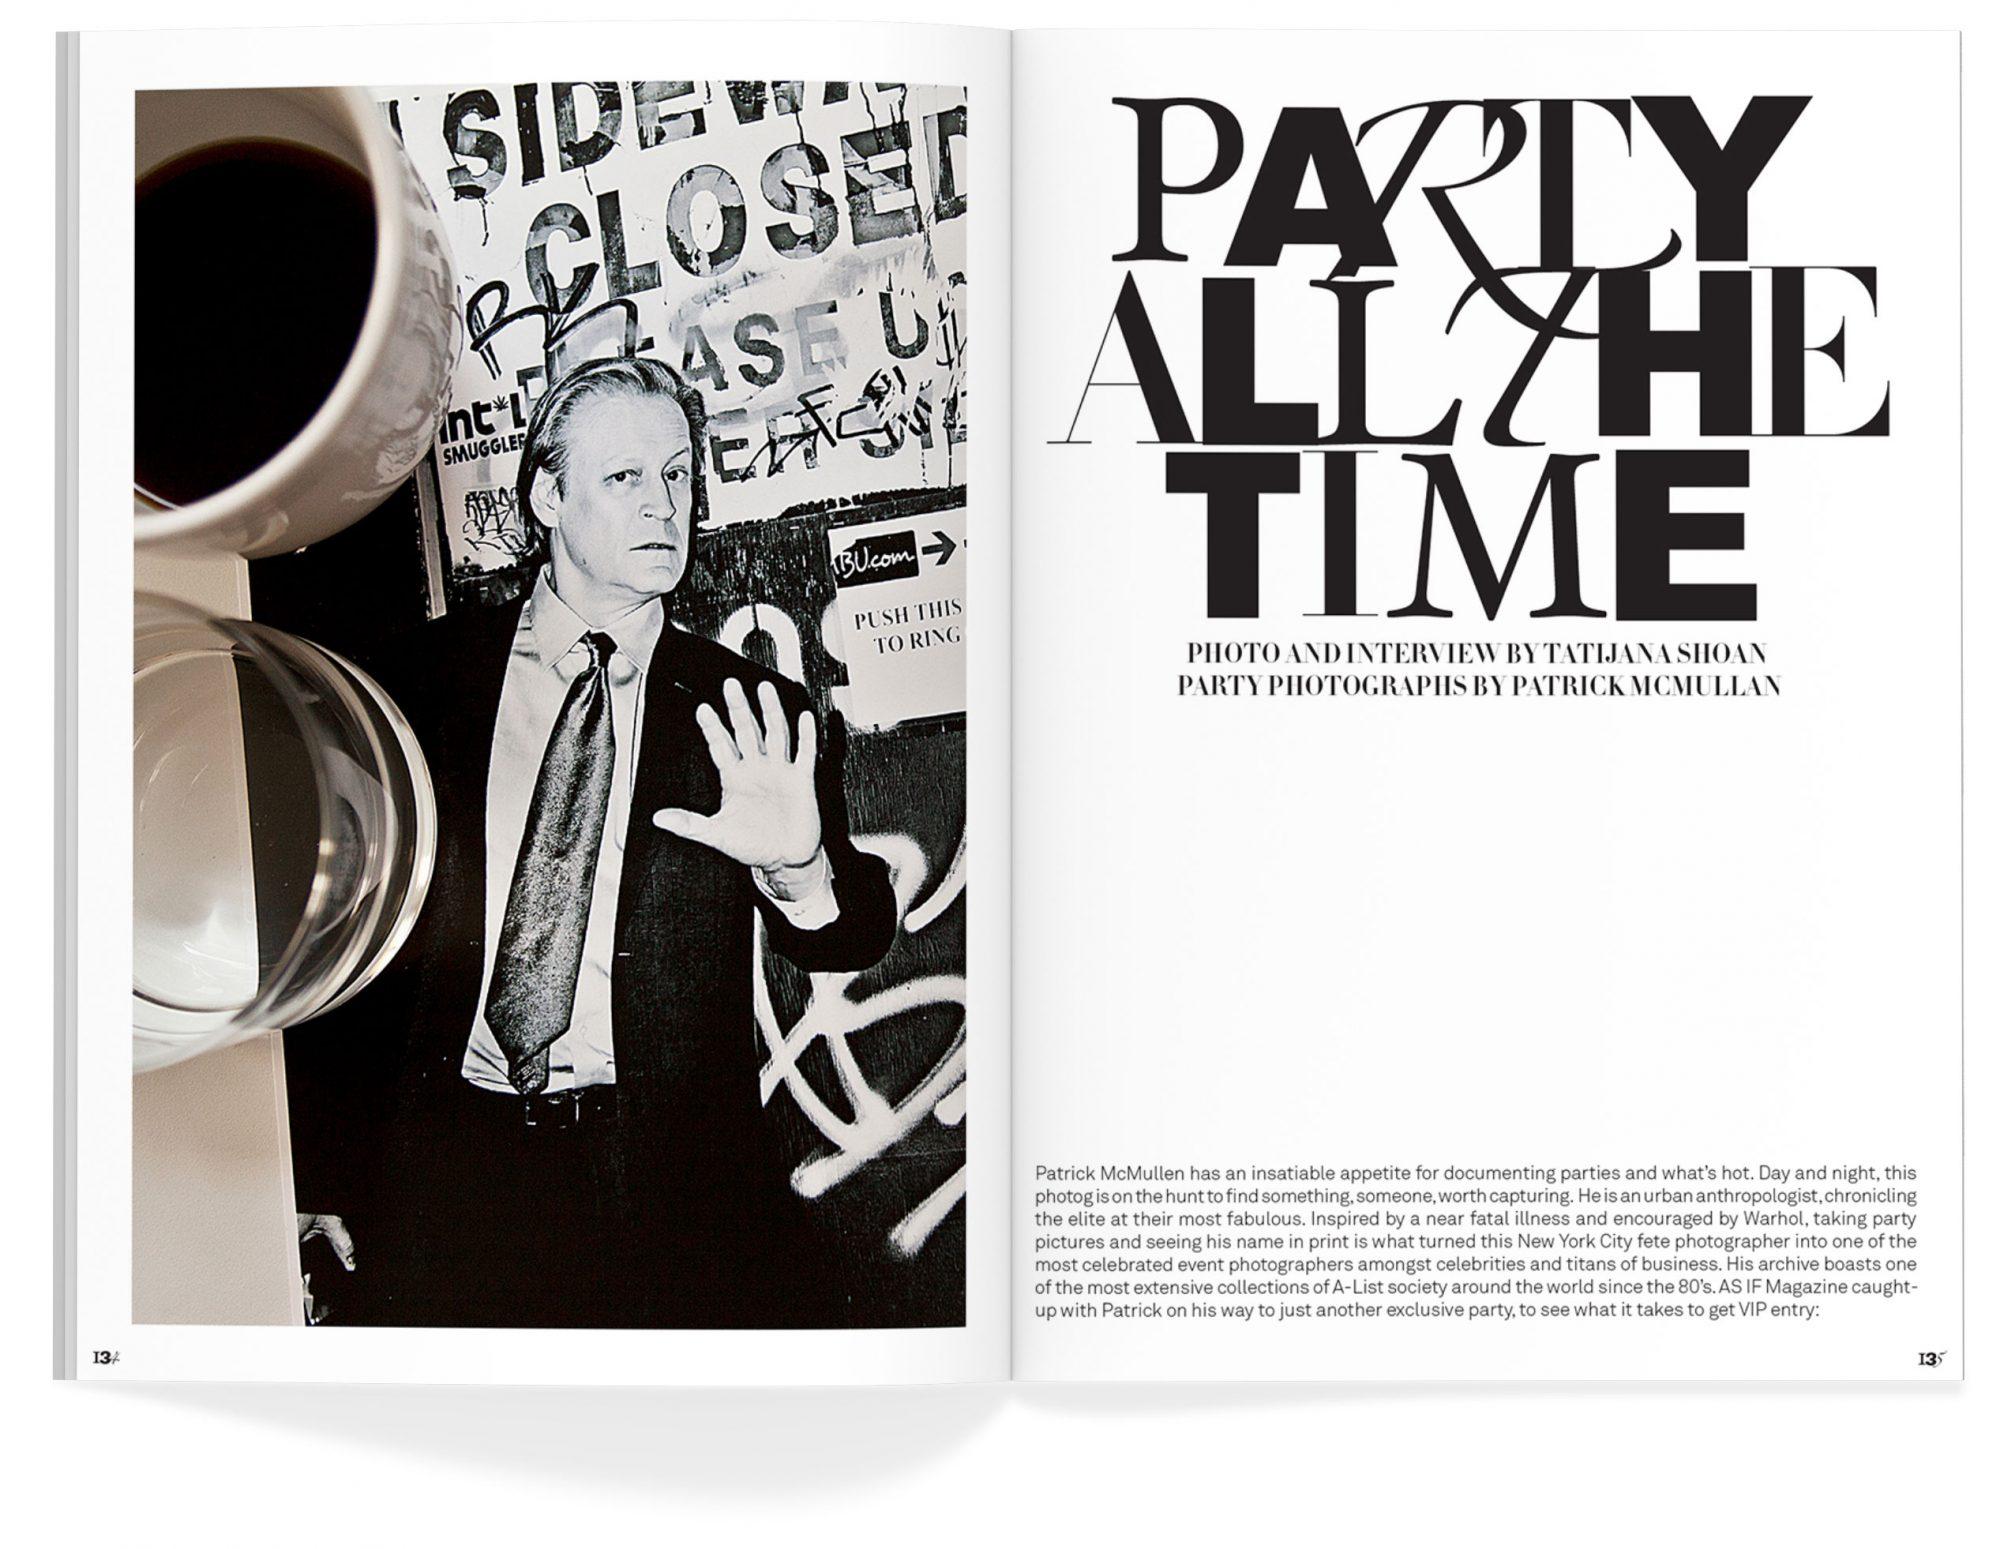 IF Studio - AS IF Magazine